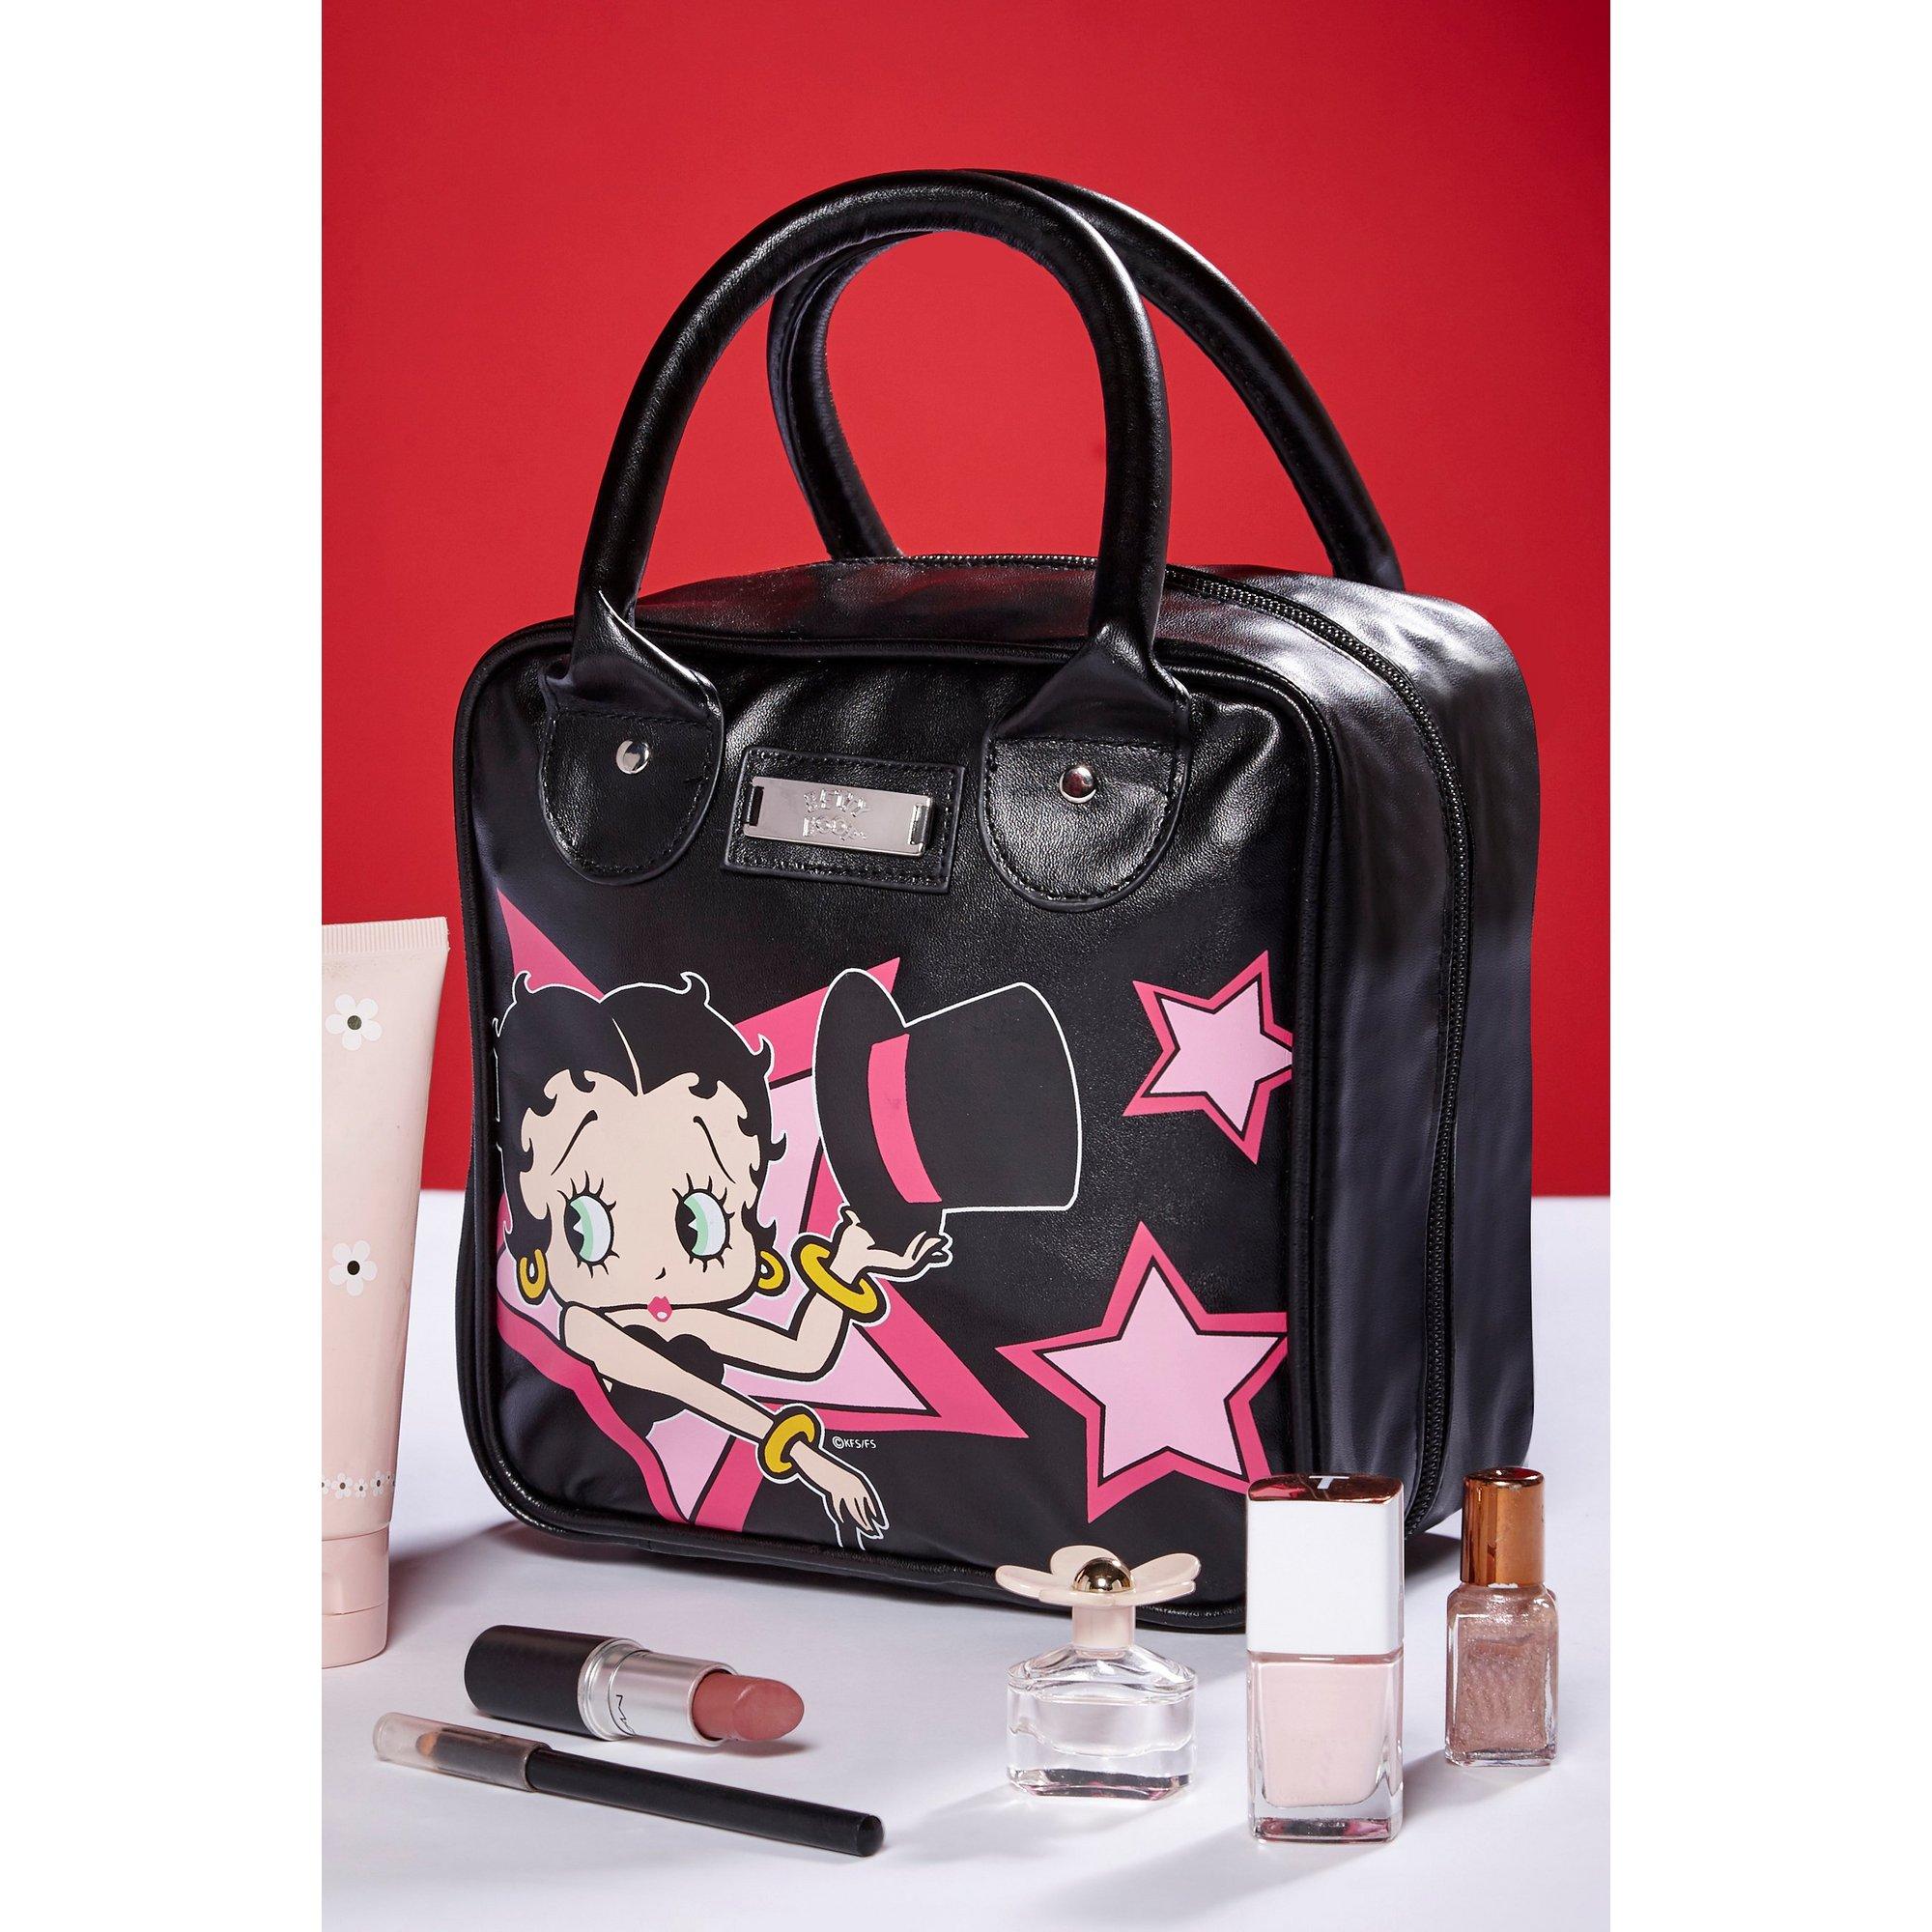 Image of Betty Boop Show Girl Vanity Bag